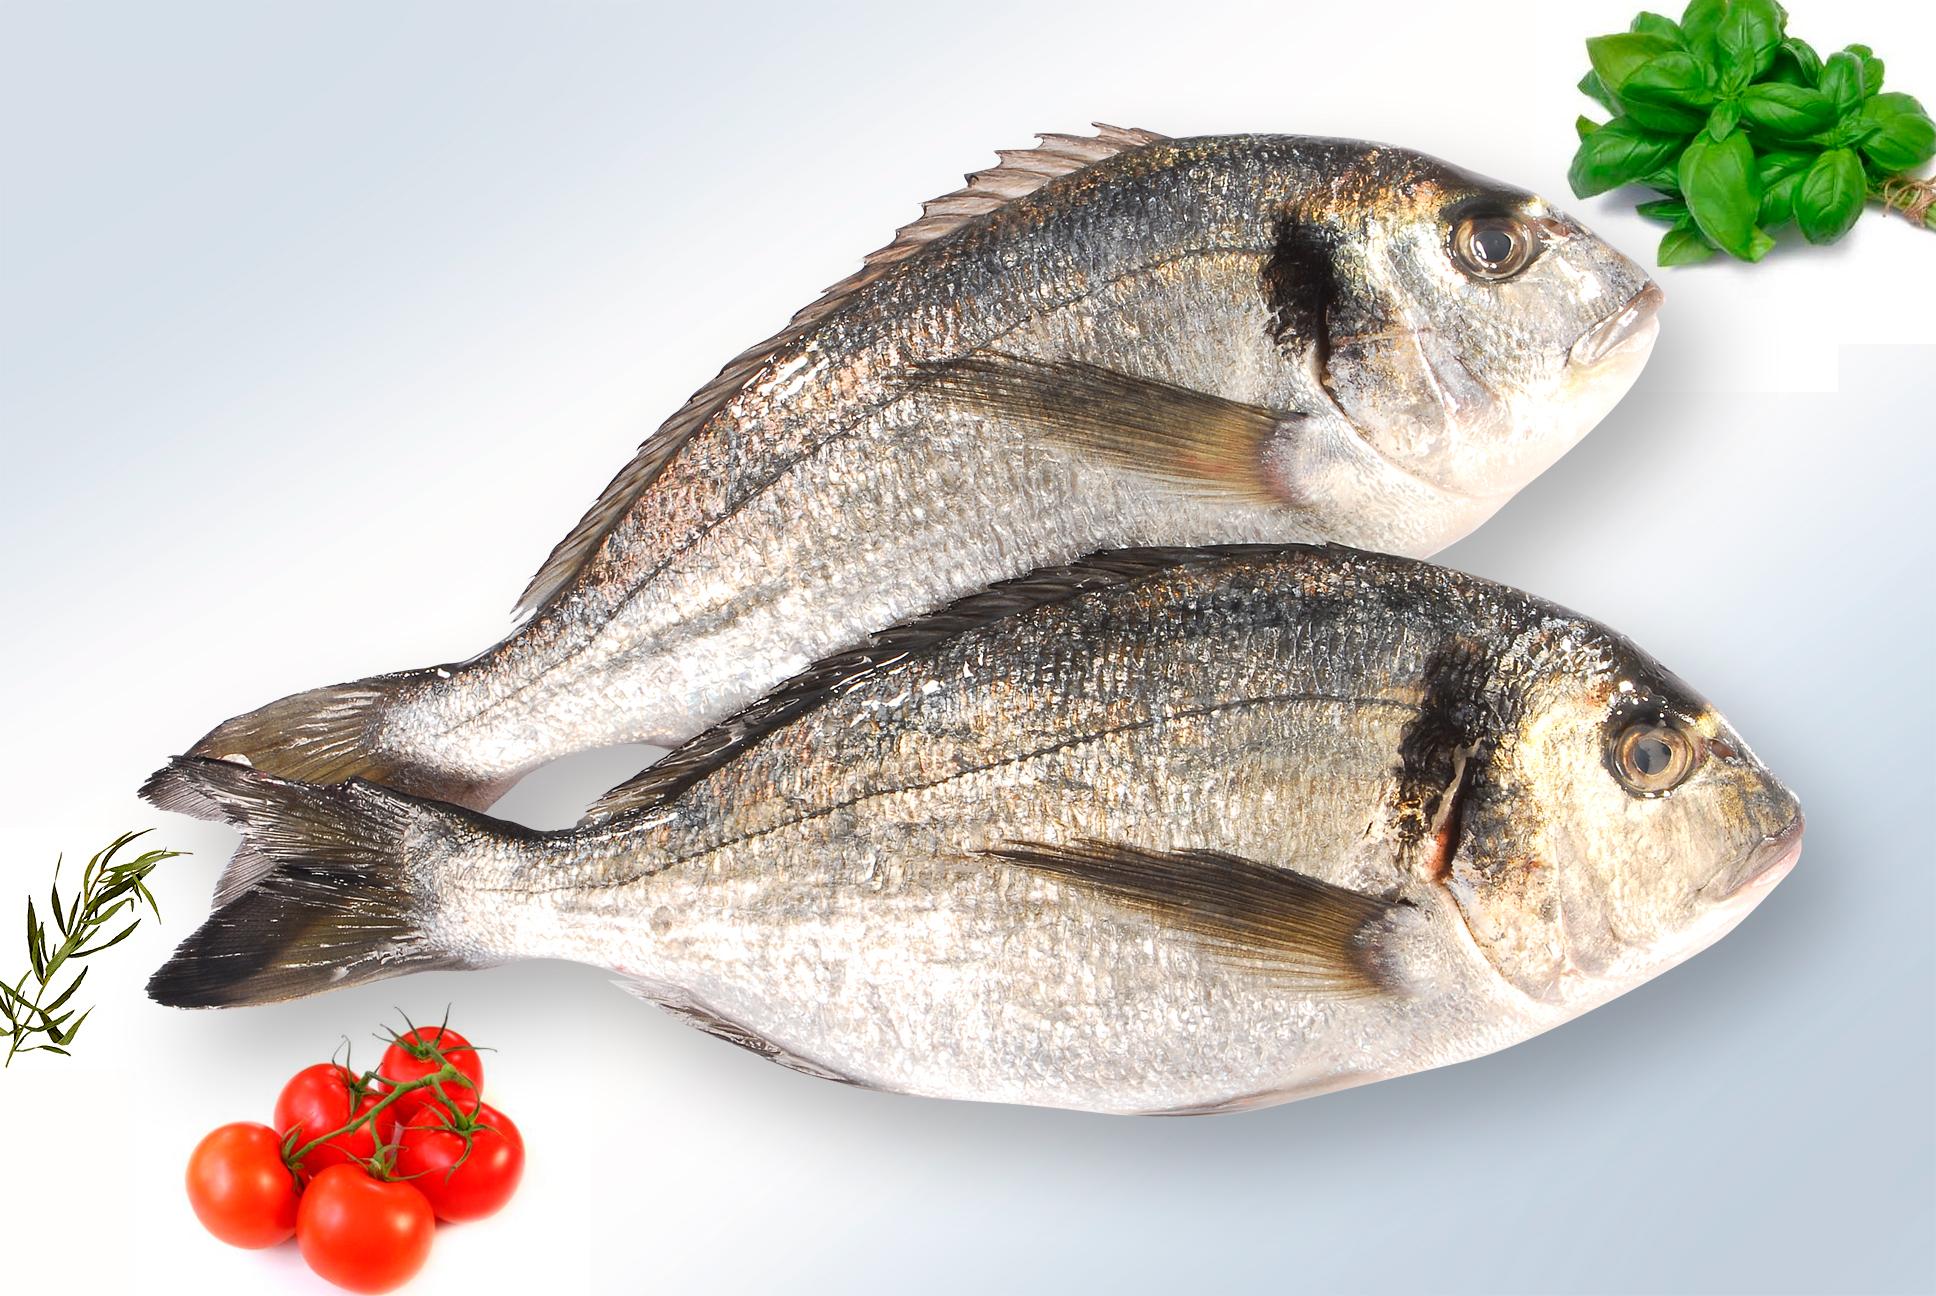 Cuisson poissons top cuisson temps de cuisson page 2 for Dorade en papillote au barbecue